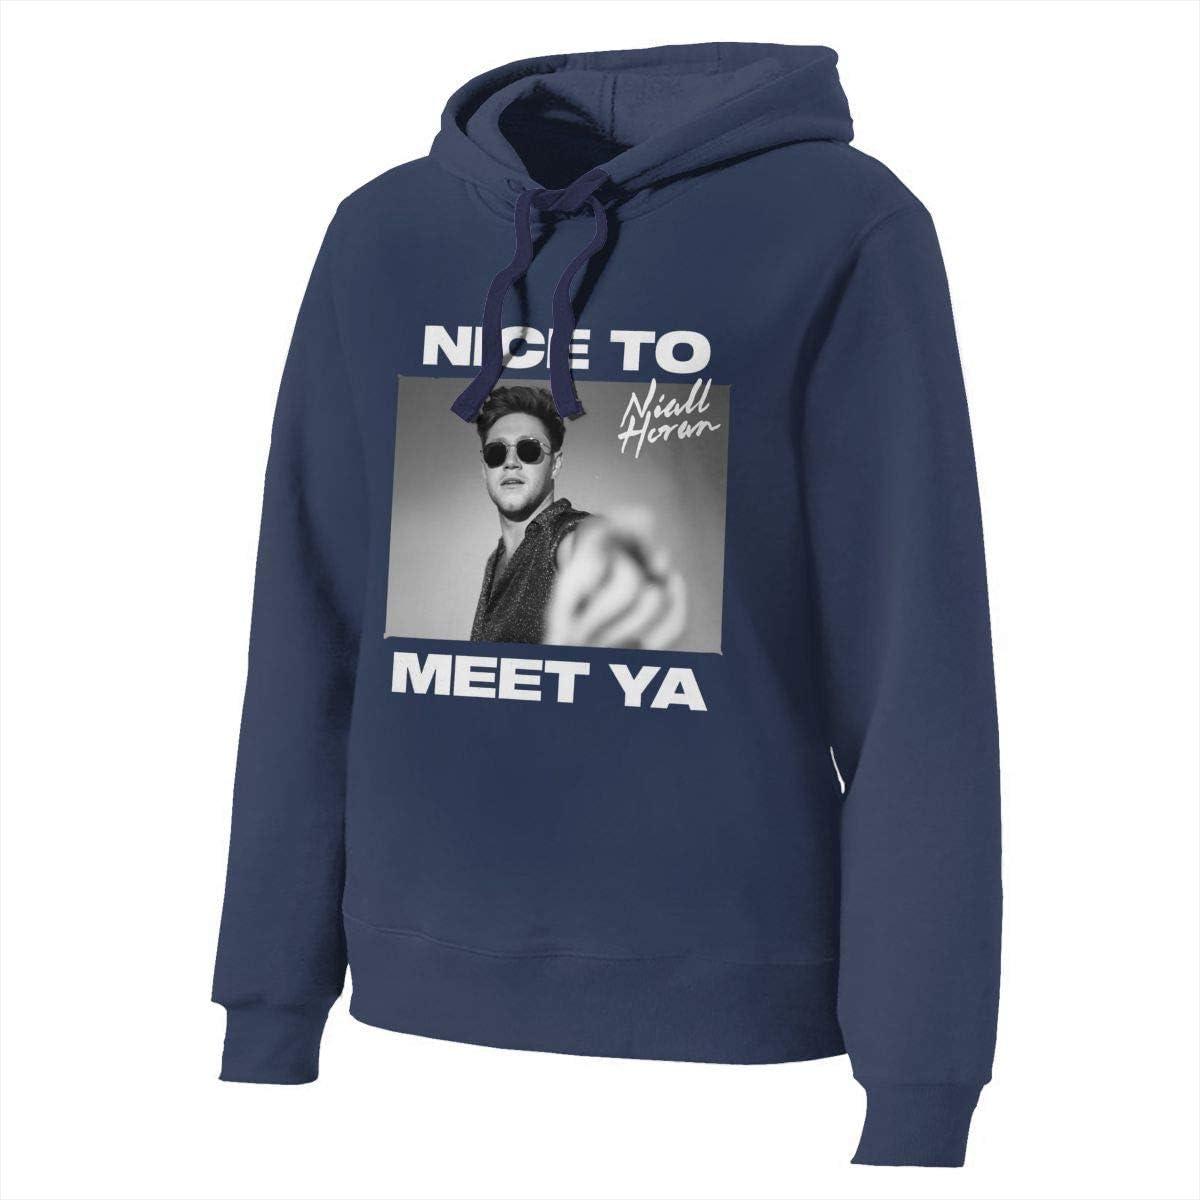 Standard Ranking TOP4 35% OFF Price Niall Horan Nice to Sweatshirts Meet Women's Ya H